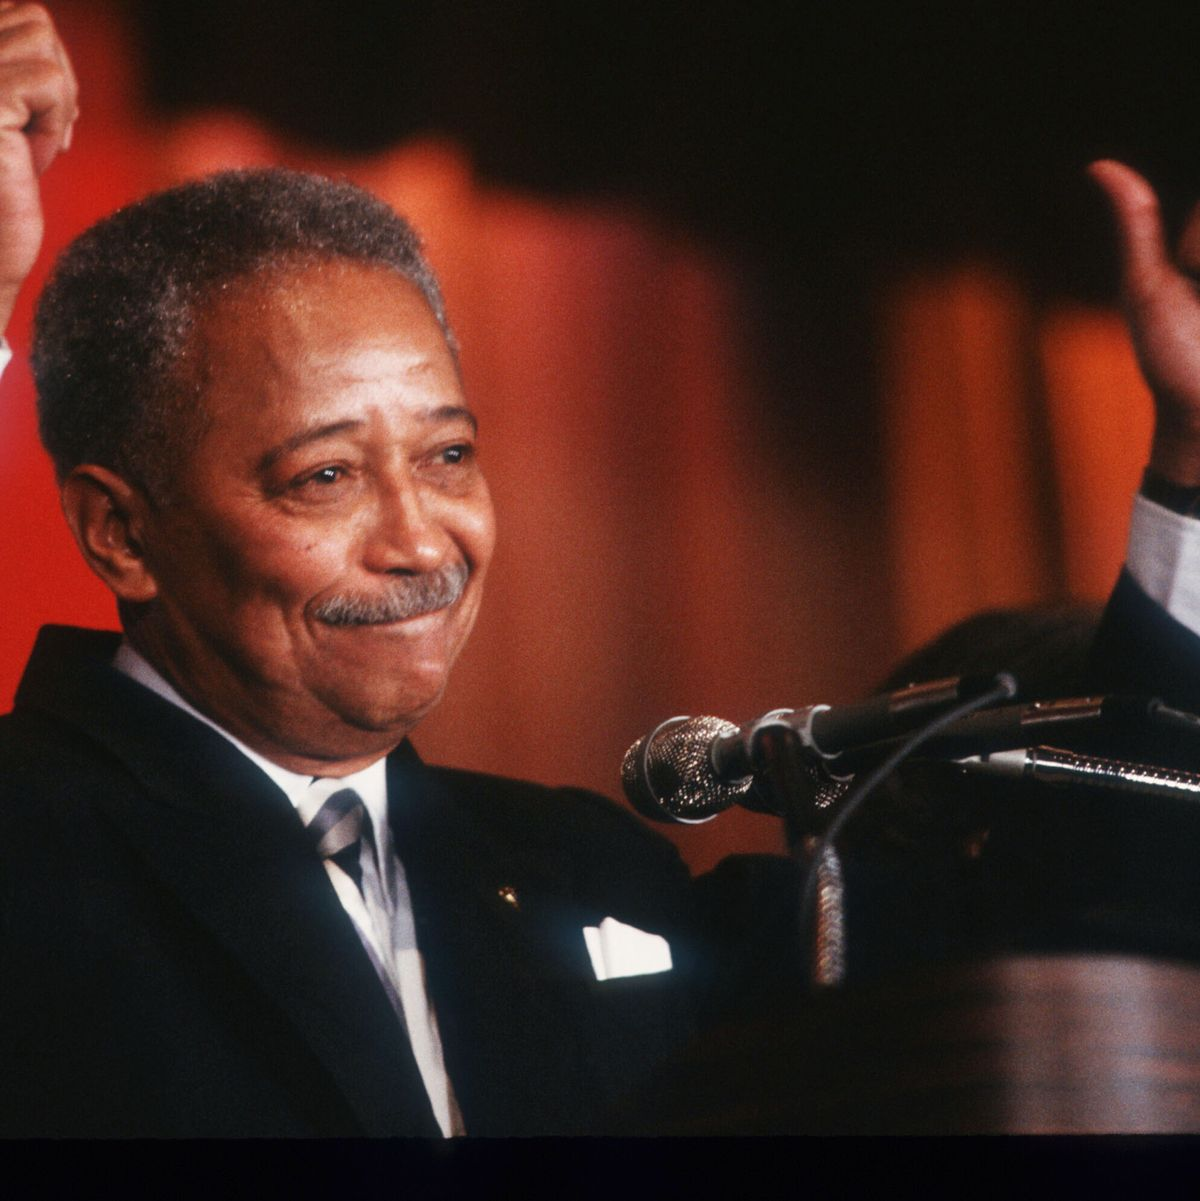 7cbkm64klkqmom https nymag com intelligencer 2020 11 david dinkins new yorks only black mayor has died at 93 html